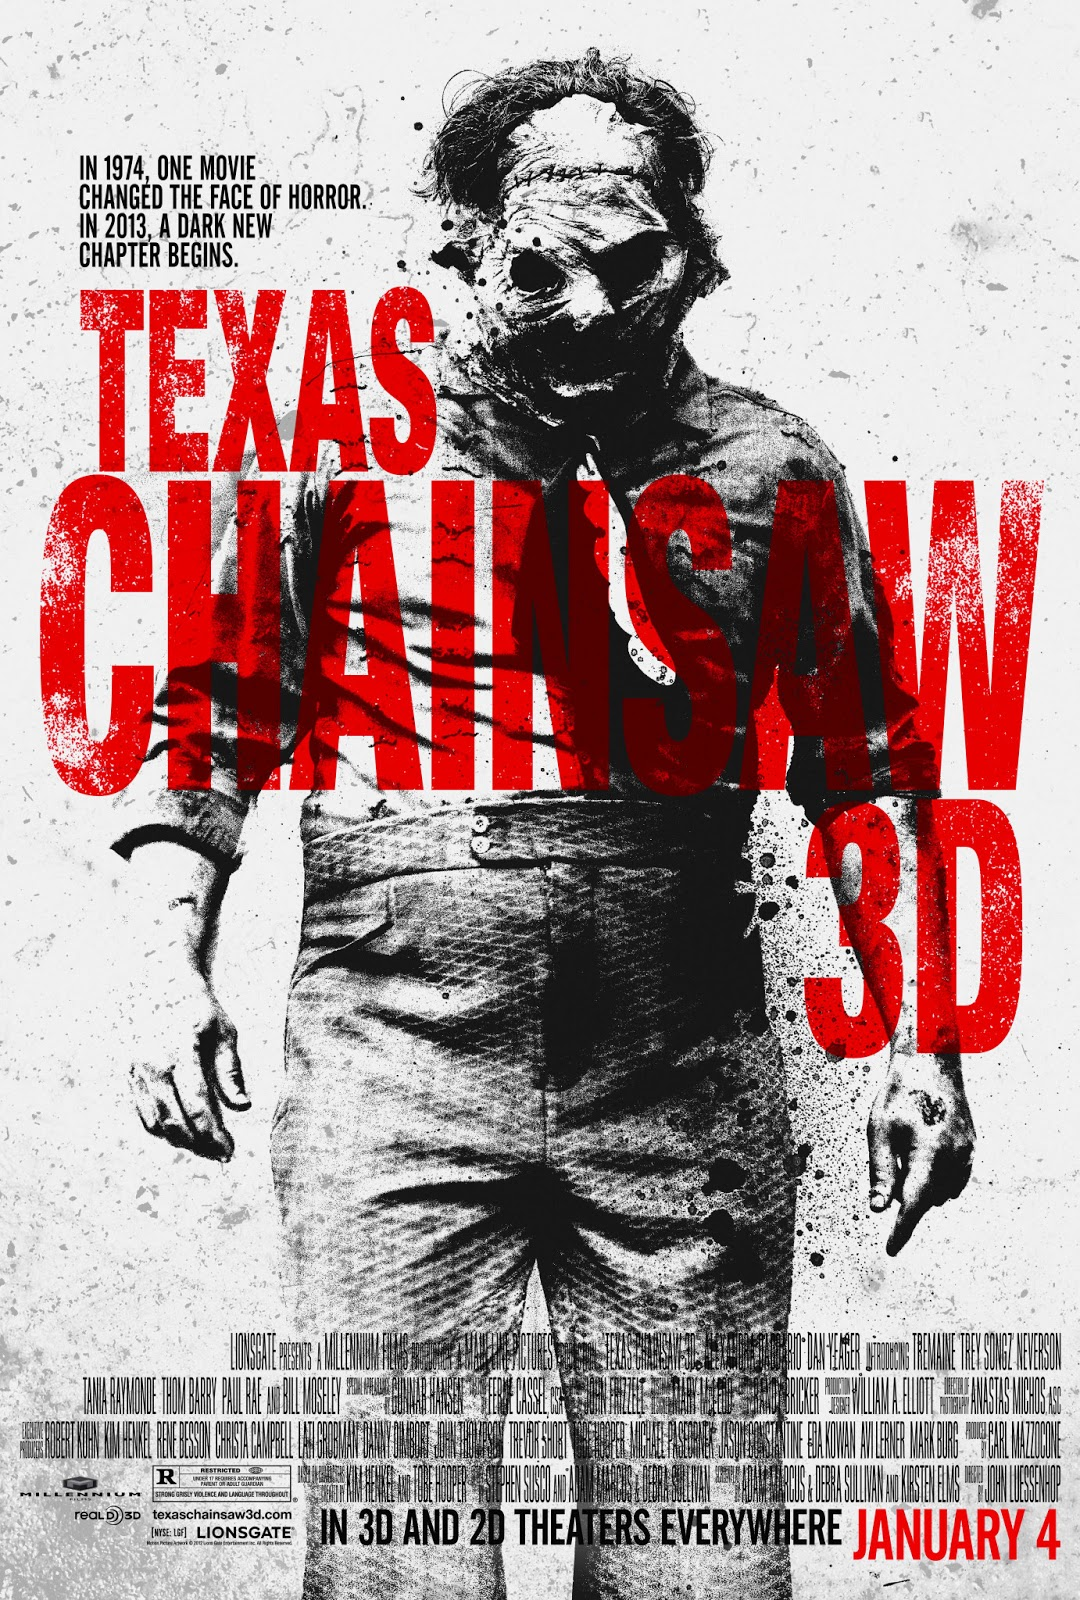 http://4.bp.blogspot.com/-yYhrQDT7r1M/UOnPCkOWLrI/AAAAAAAAFVg/5hAVrqsroOc/s1600/texas-chainsaw-3d-poster1.jpg